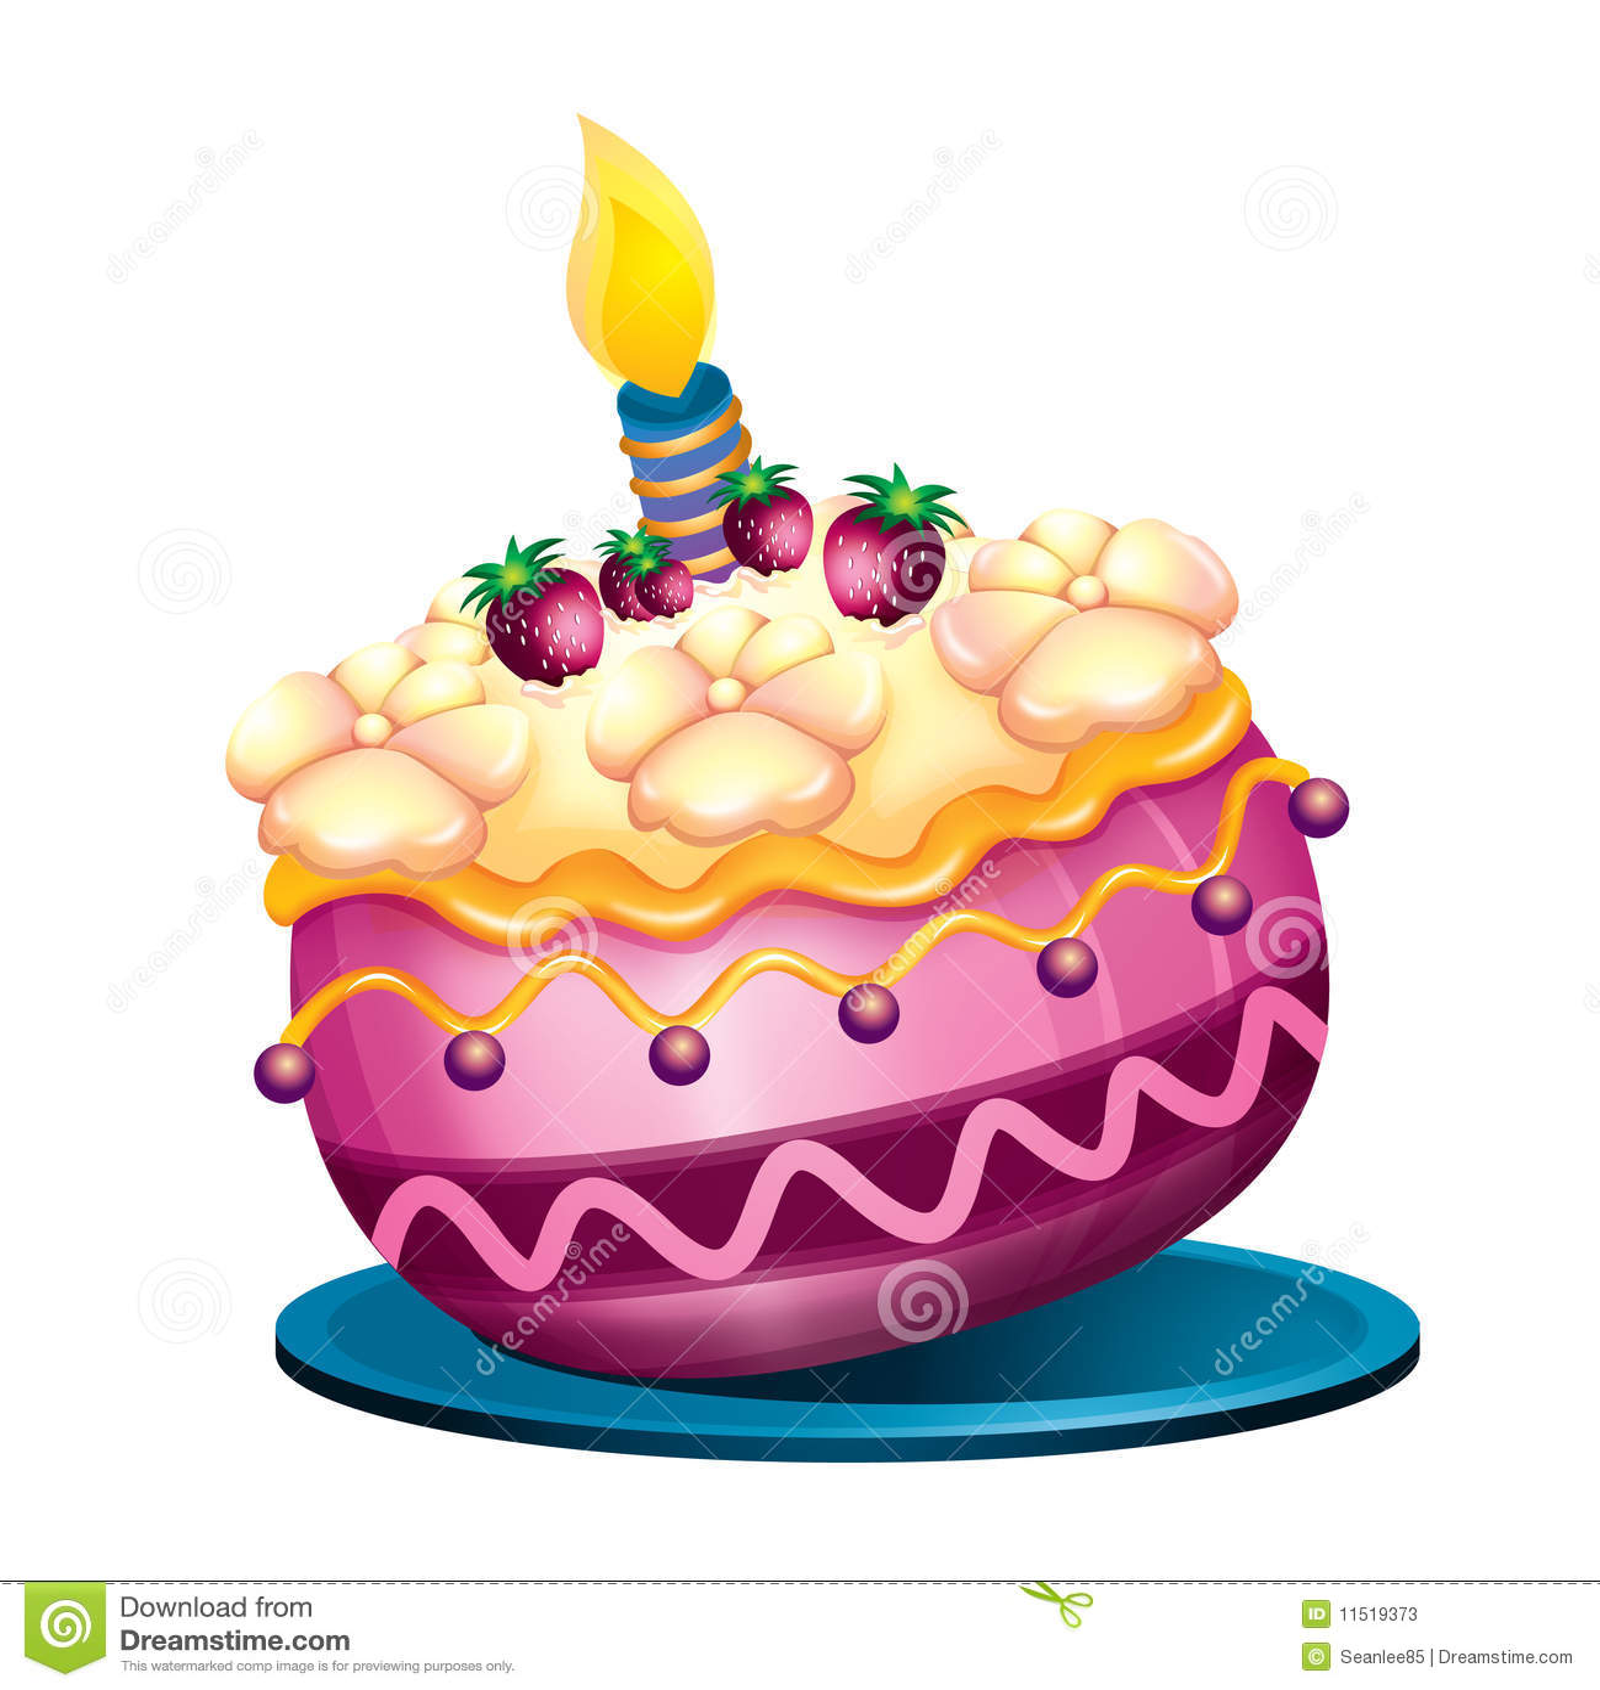 clipart torta free - photo #26